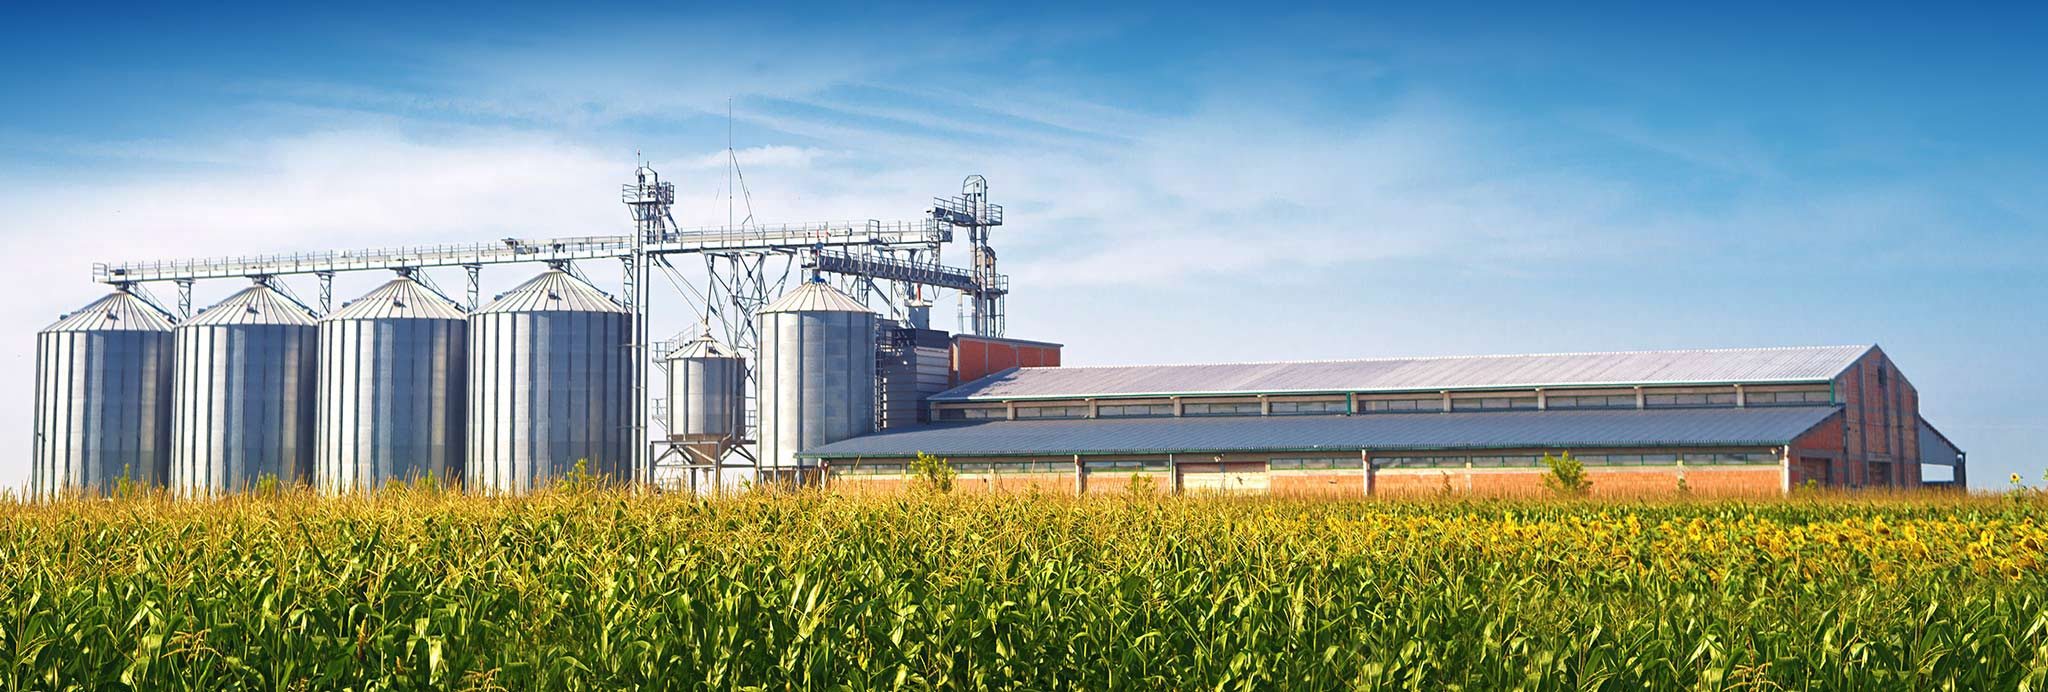 Commercial farm storage silos